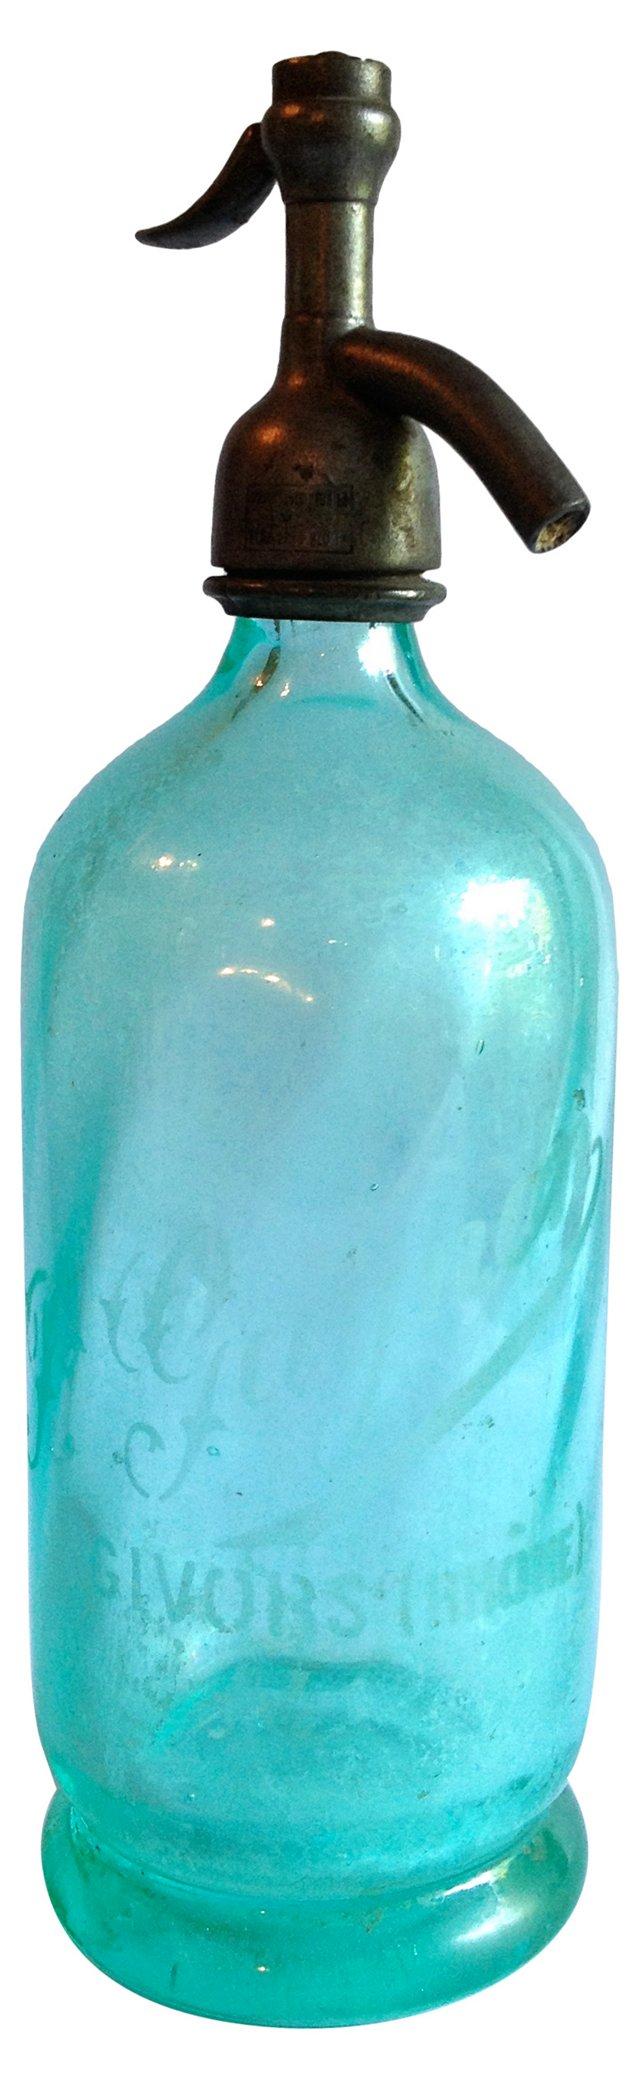 French Seltzer Bottle